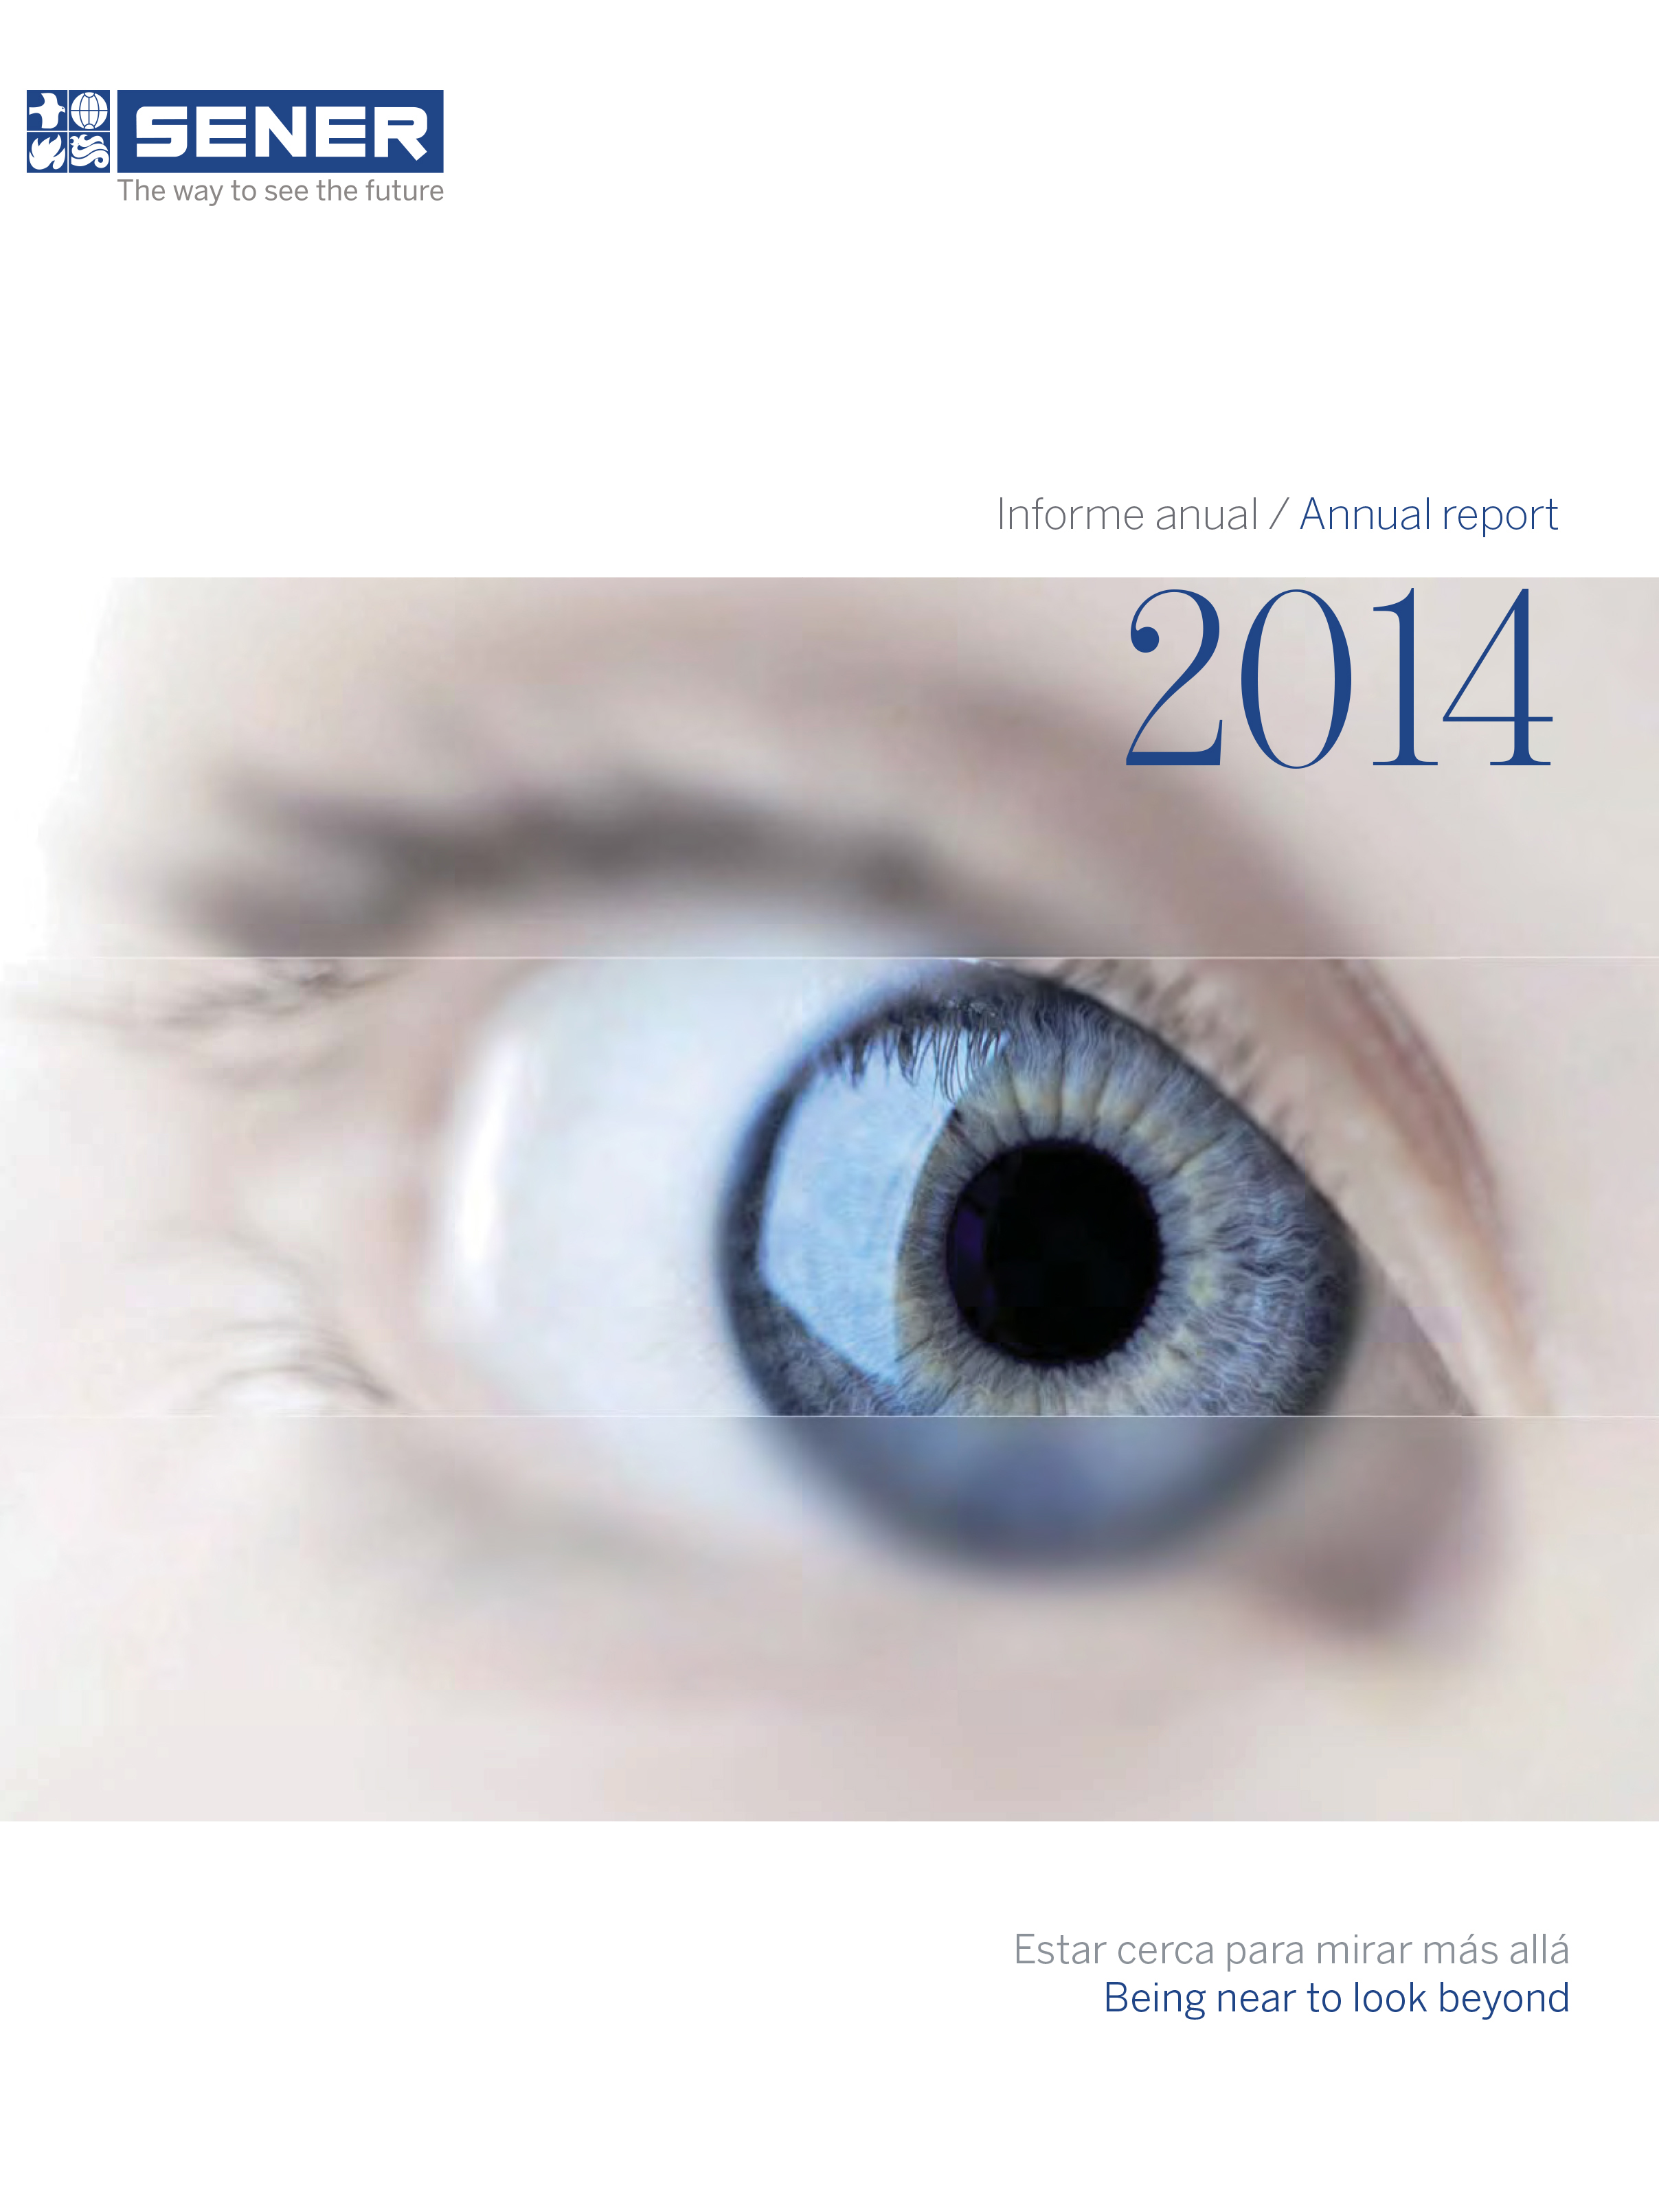 http://www.ingenieriayconstruccion.sener/ecm-images/memoria-anual-2014